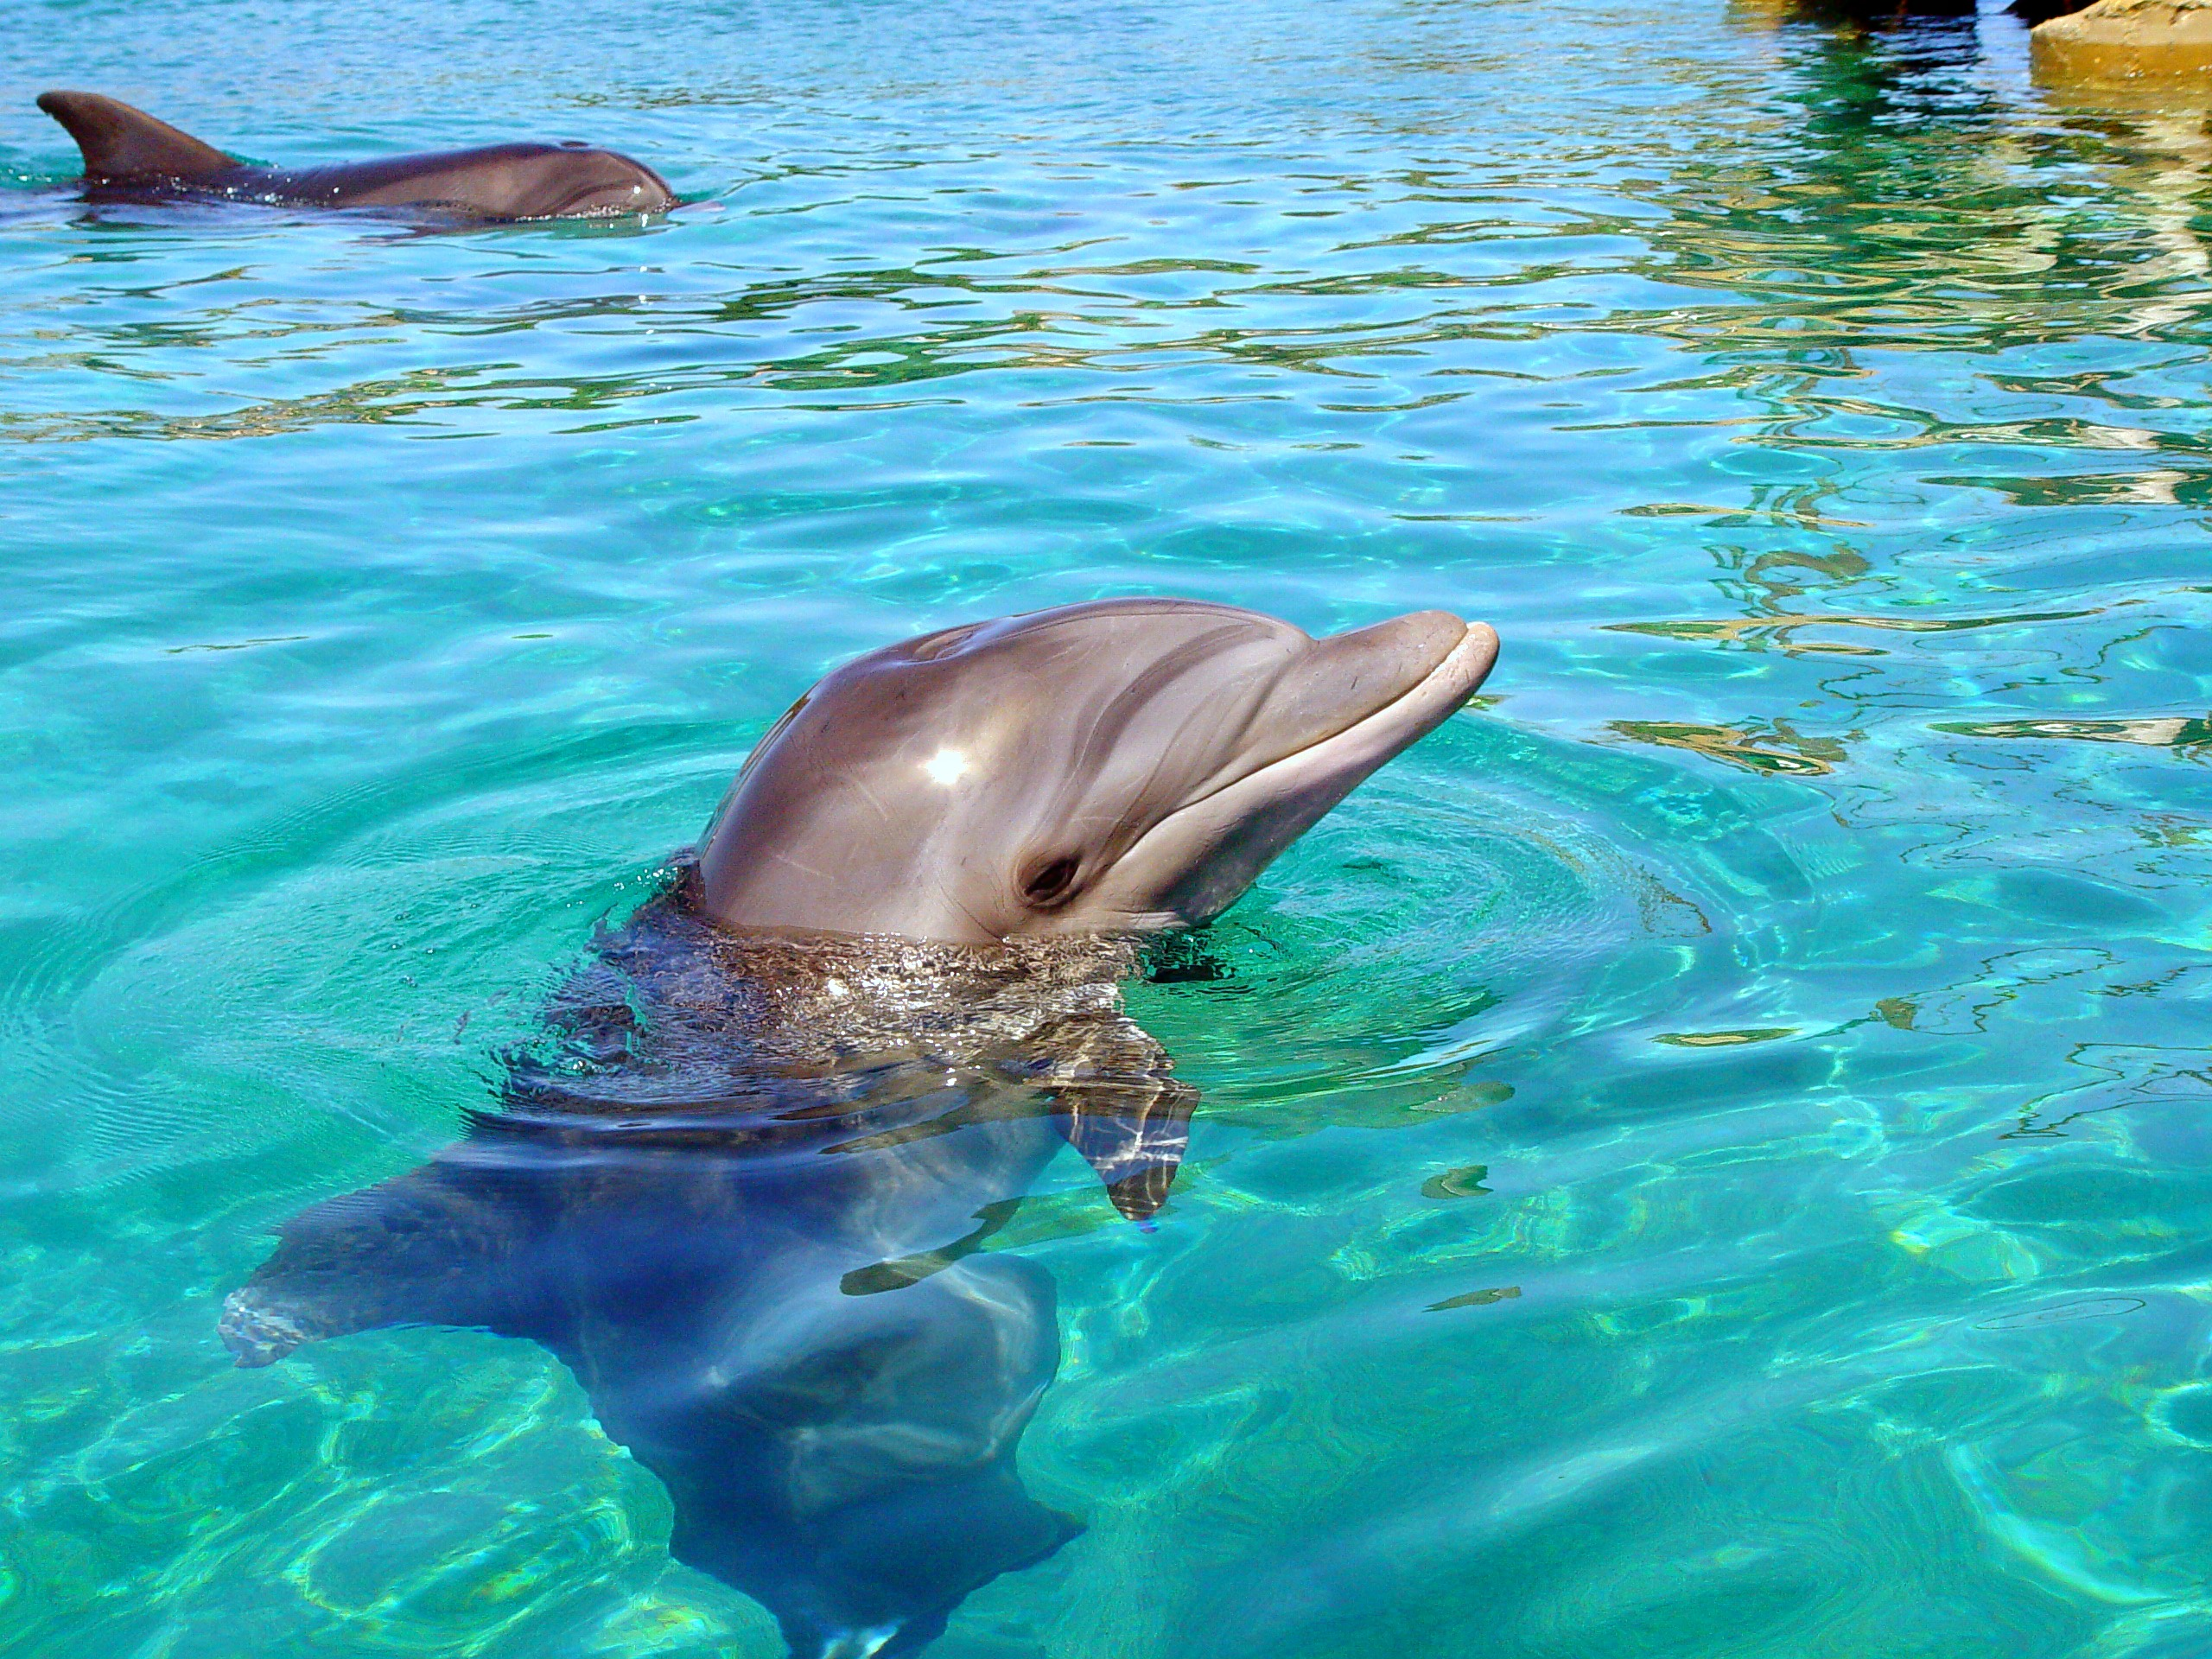 1464945434_pikiwiki_israel_15217_dolphin.jpg